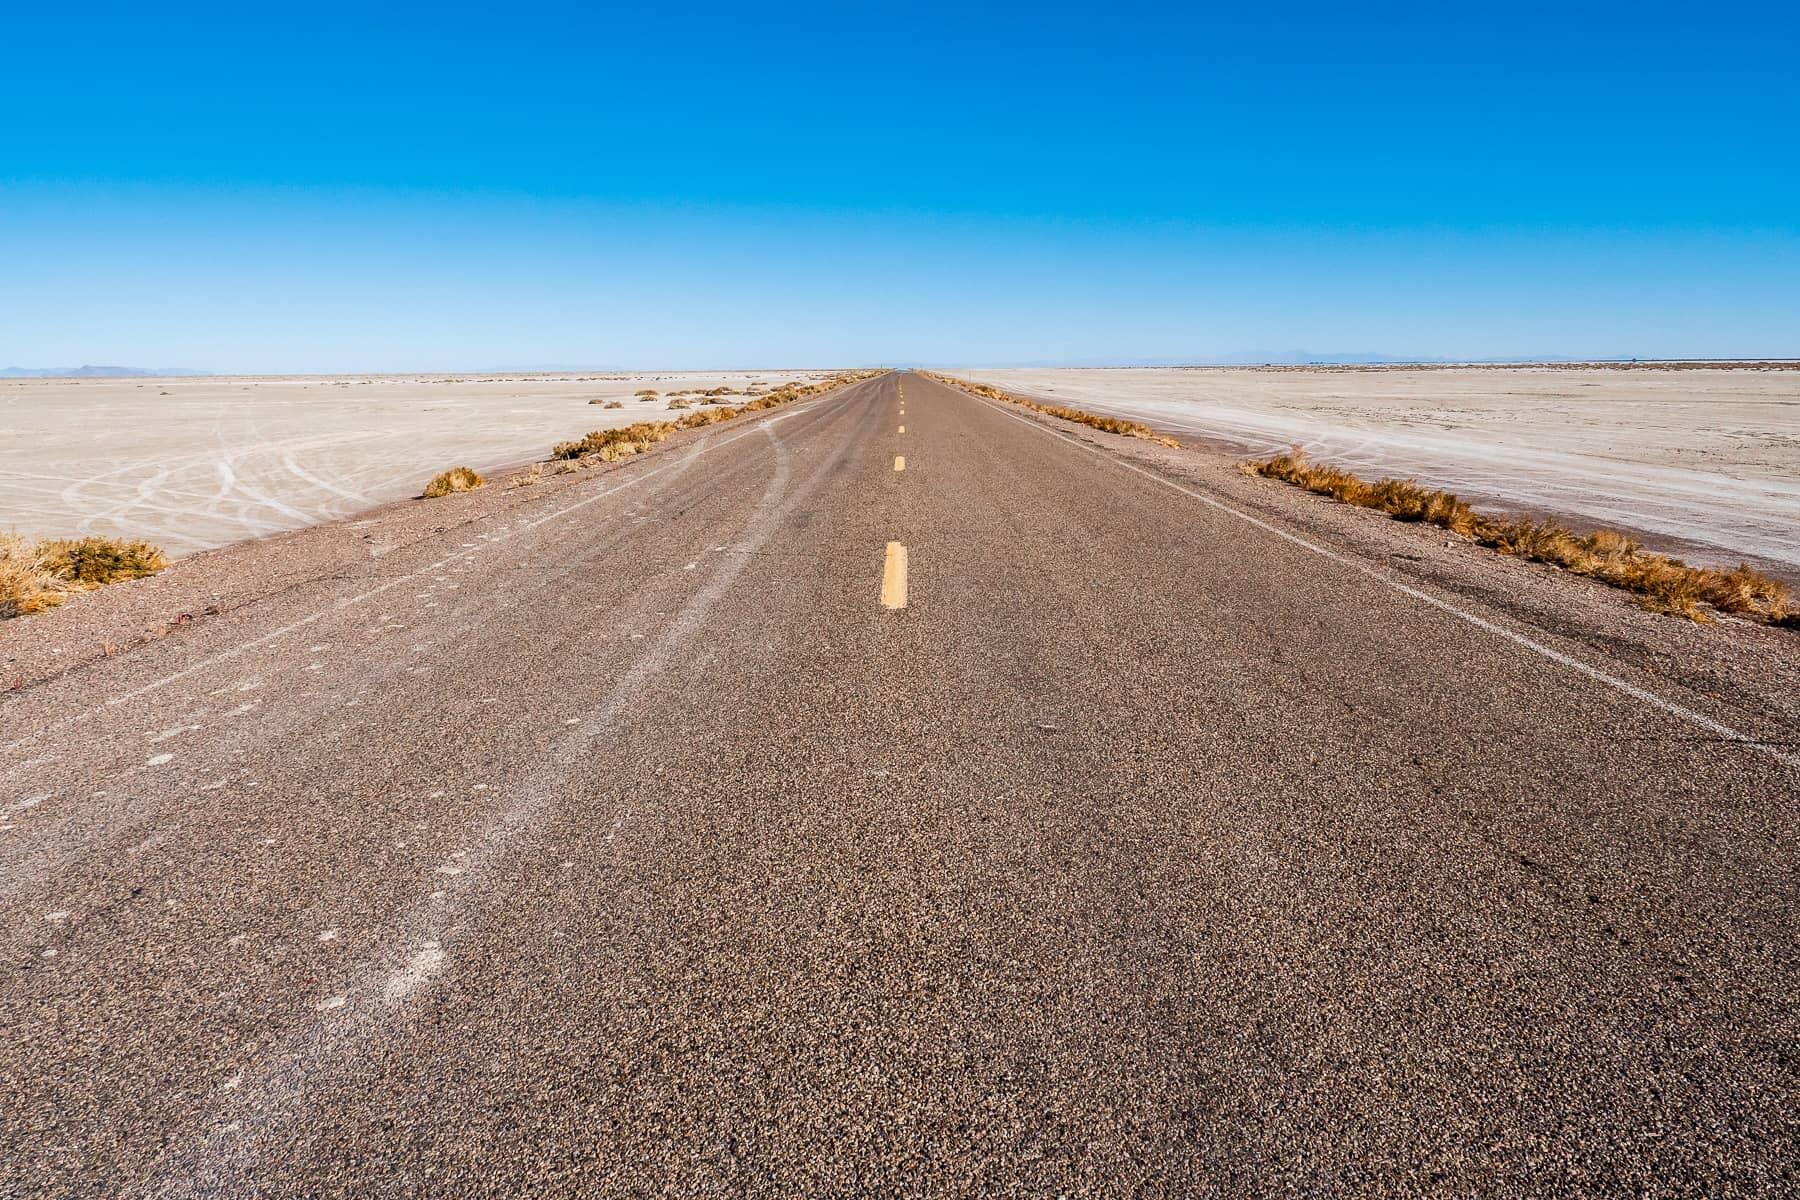 A road stretches across the arid expanse of Utah's Bonneville Salt Flats.